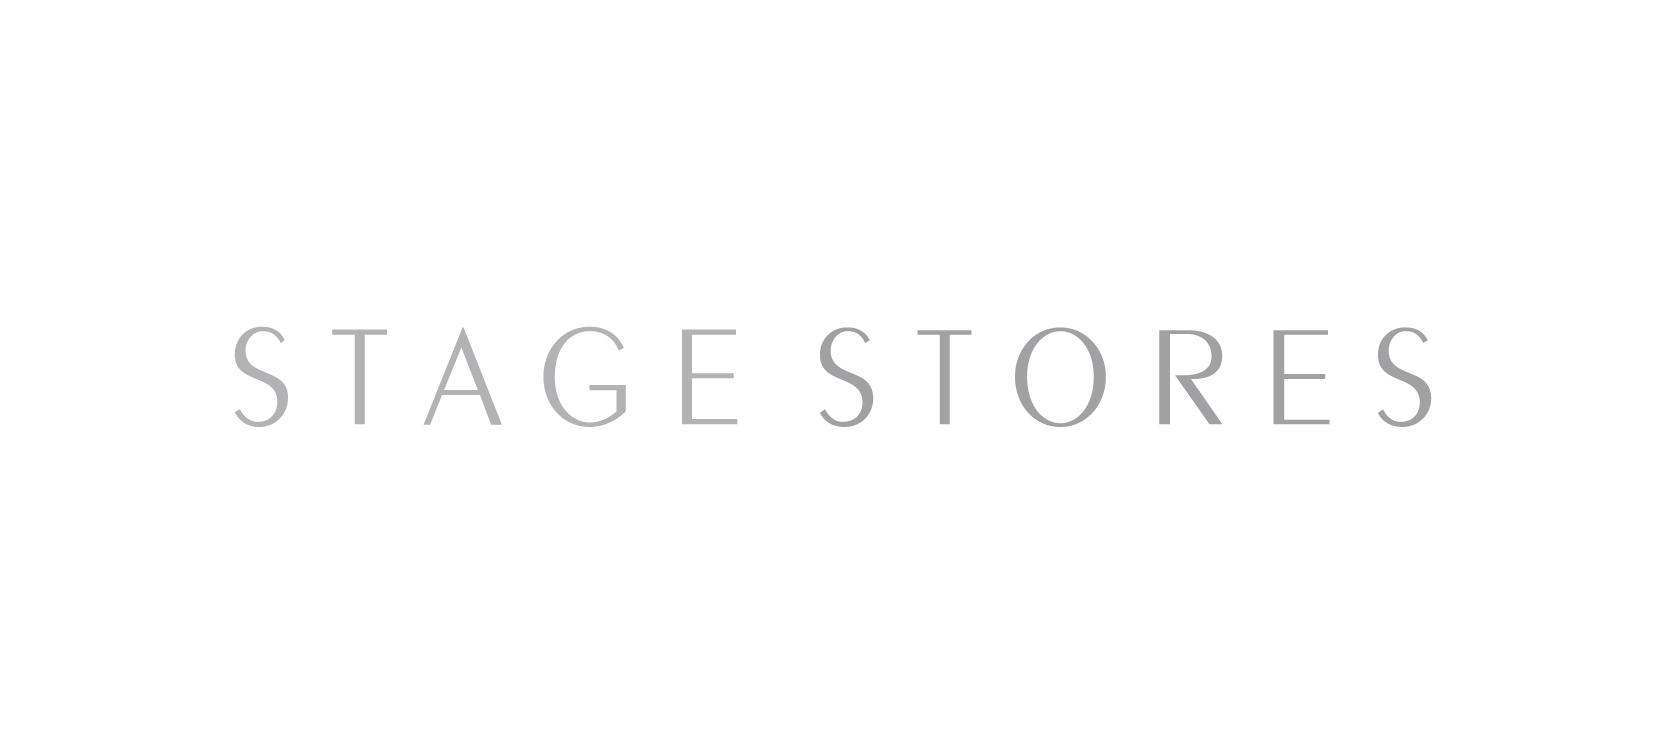 StageStores.jpg